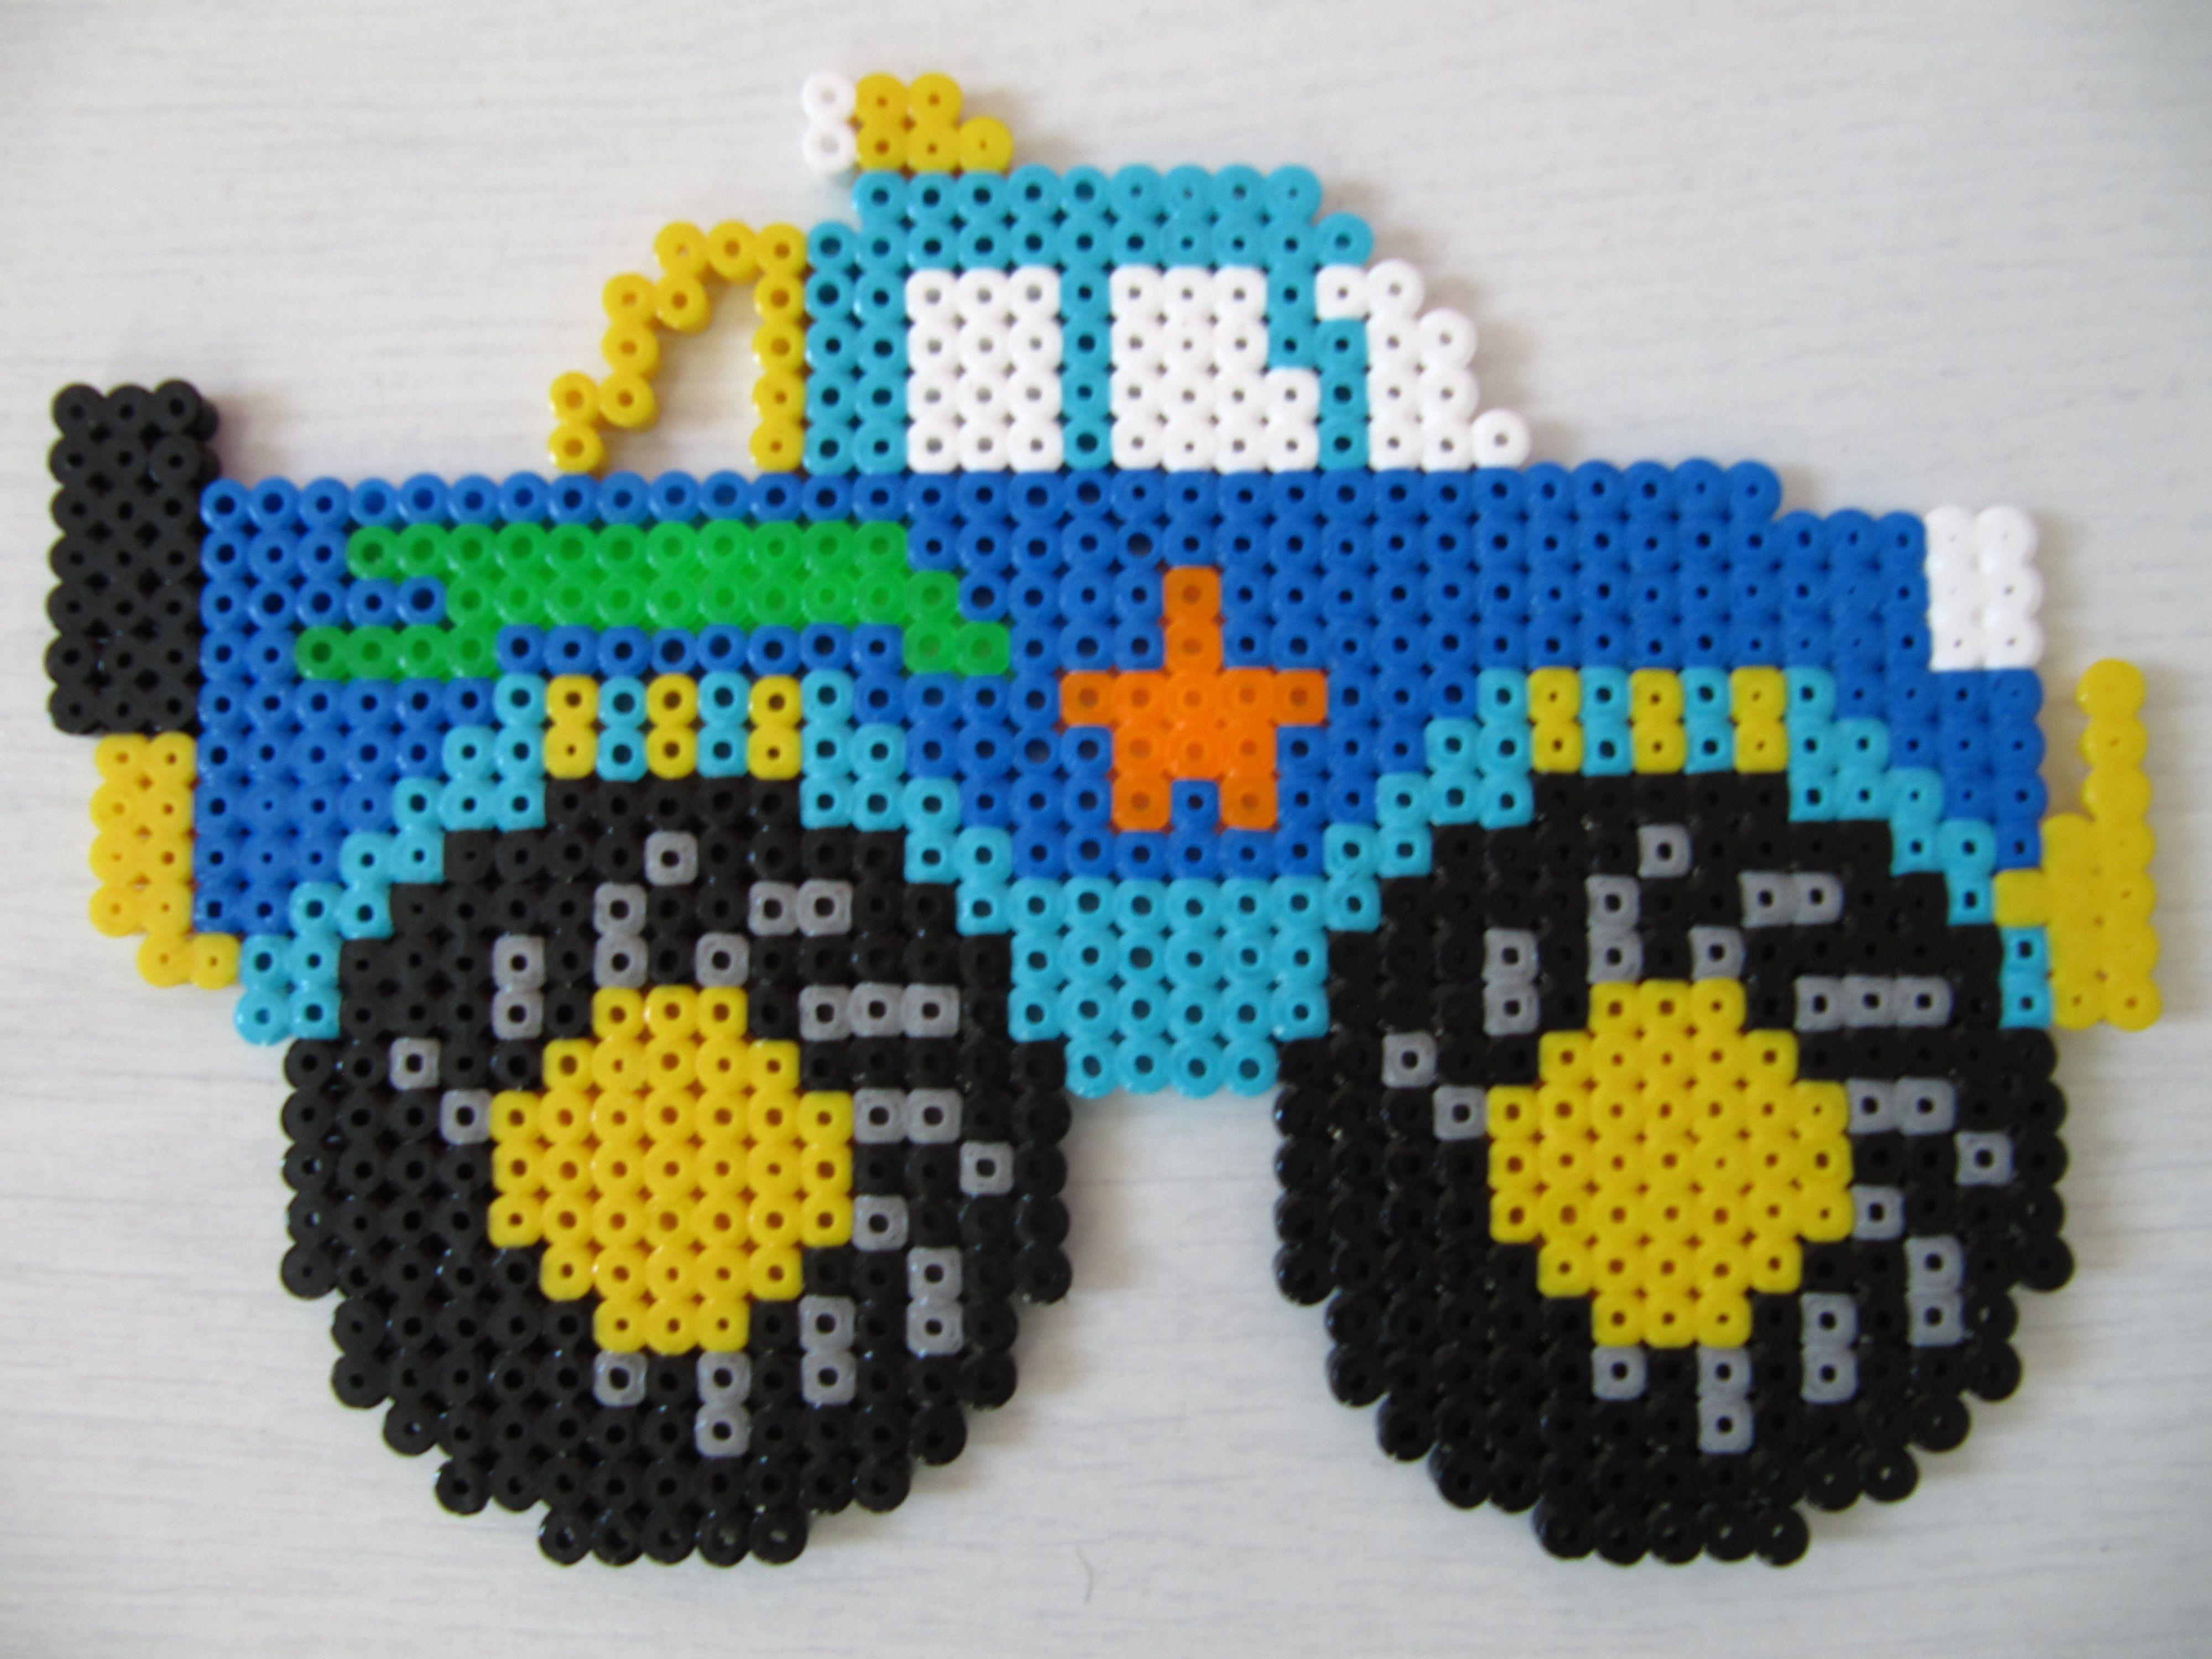 Roadster Pearler Beads Pinterest Bügelperlen Steckperlen Und Hama